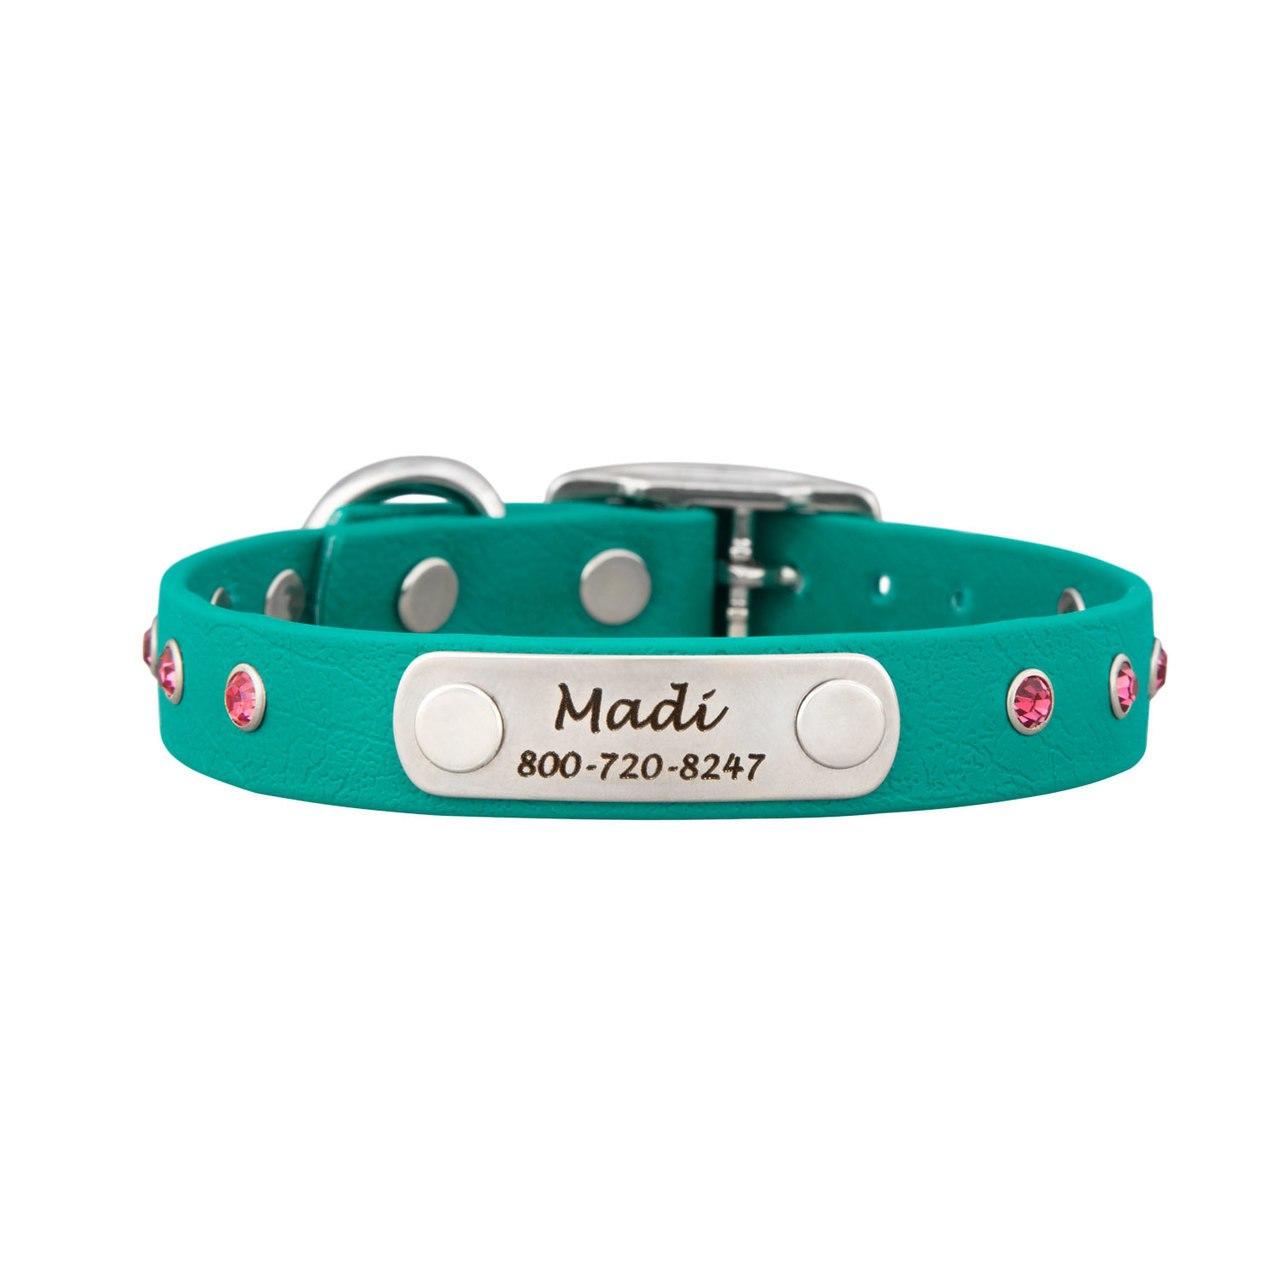 Jewel Series Rhinestone Small Dog Collar with Nameplate Teal with Pink Rhinestones